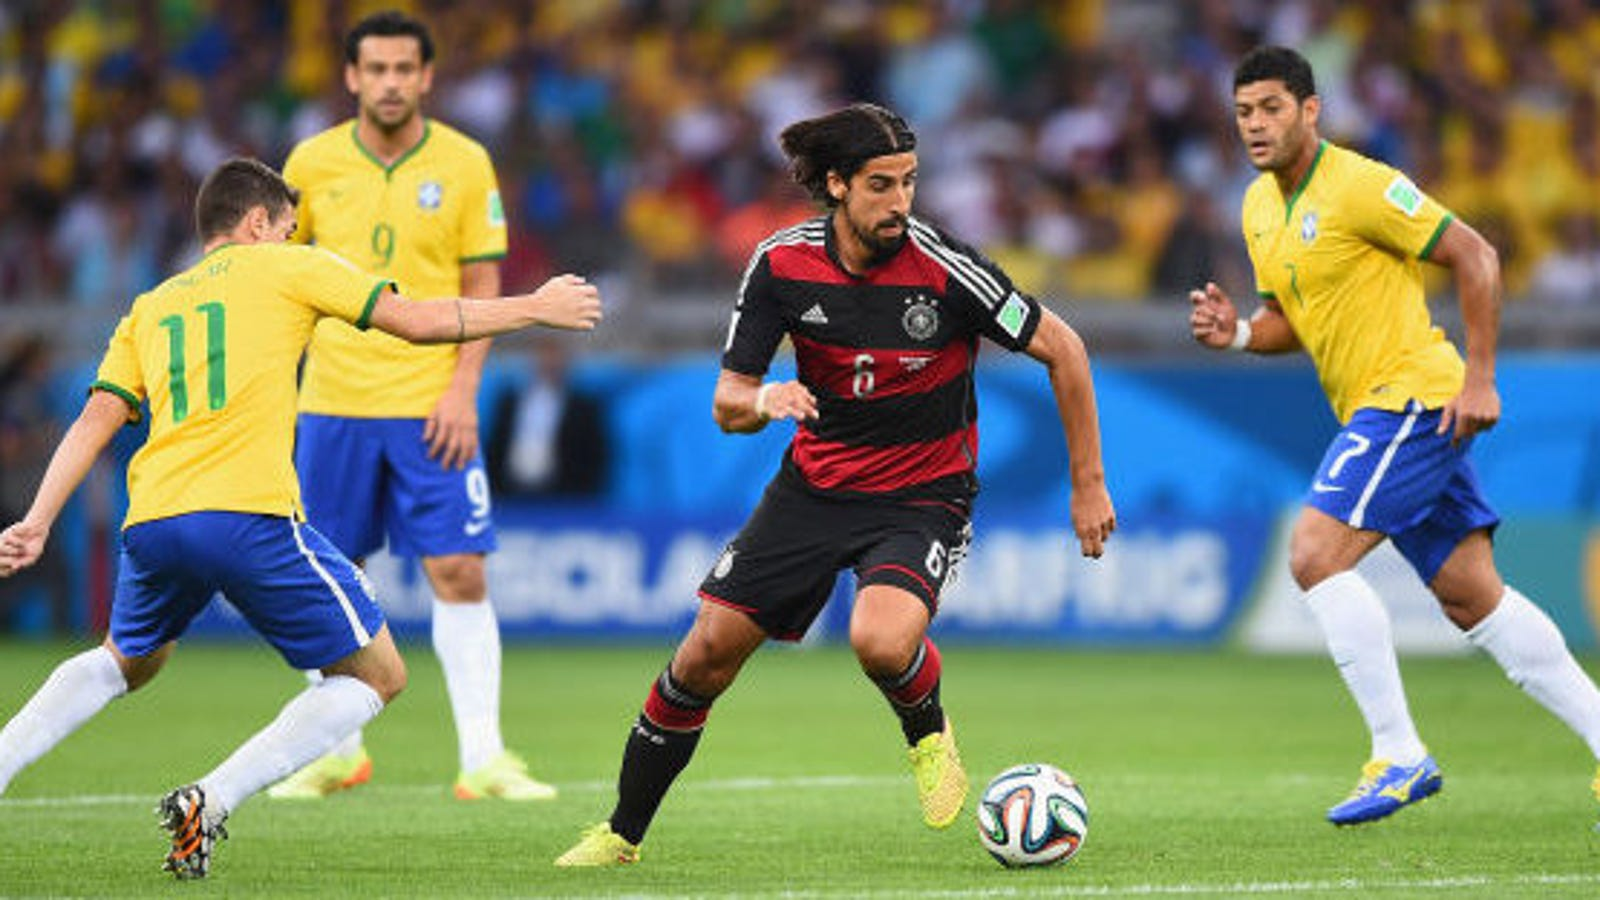 How Far Do Soccer Players Run During a Match?